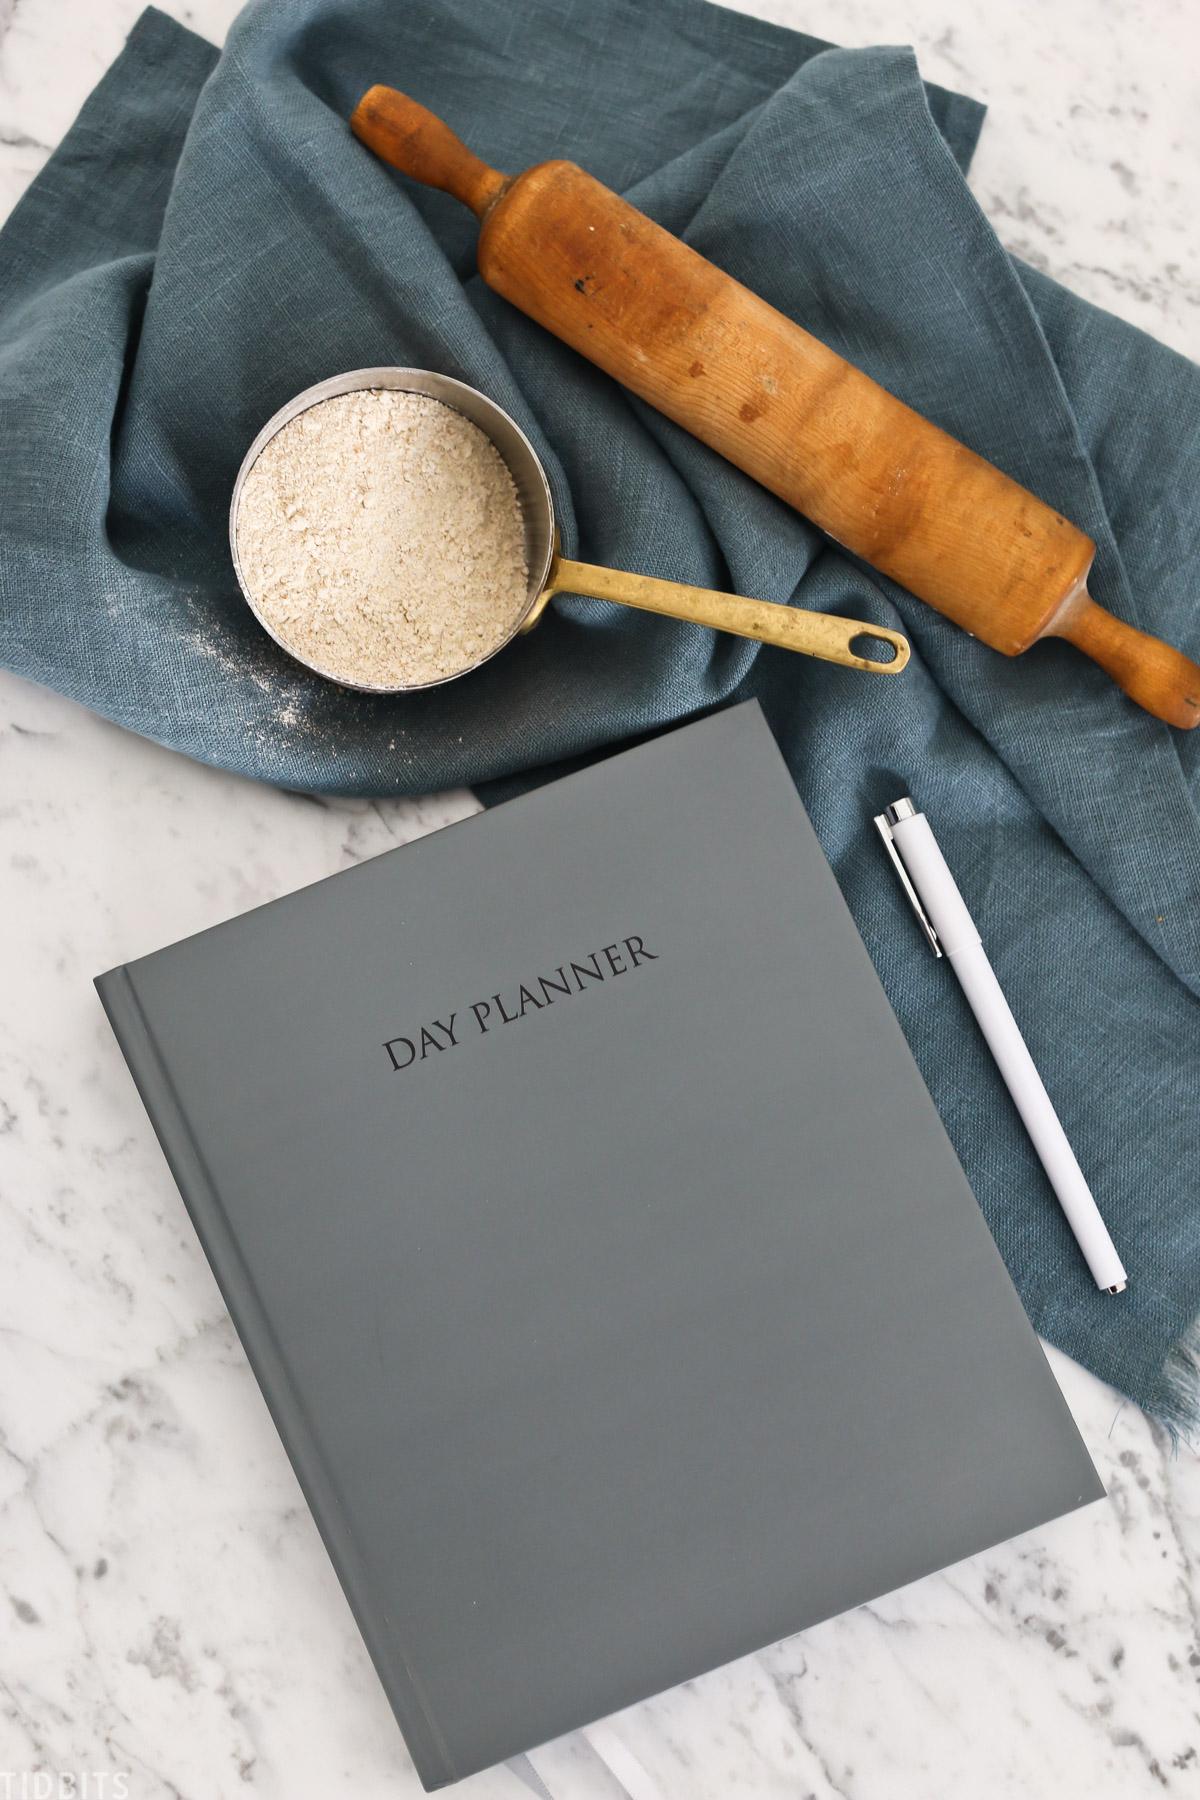 menu planning in your planner